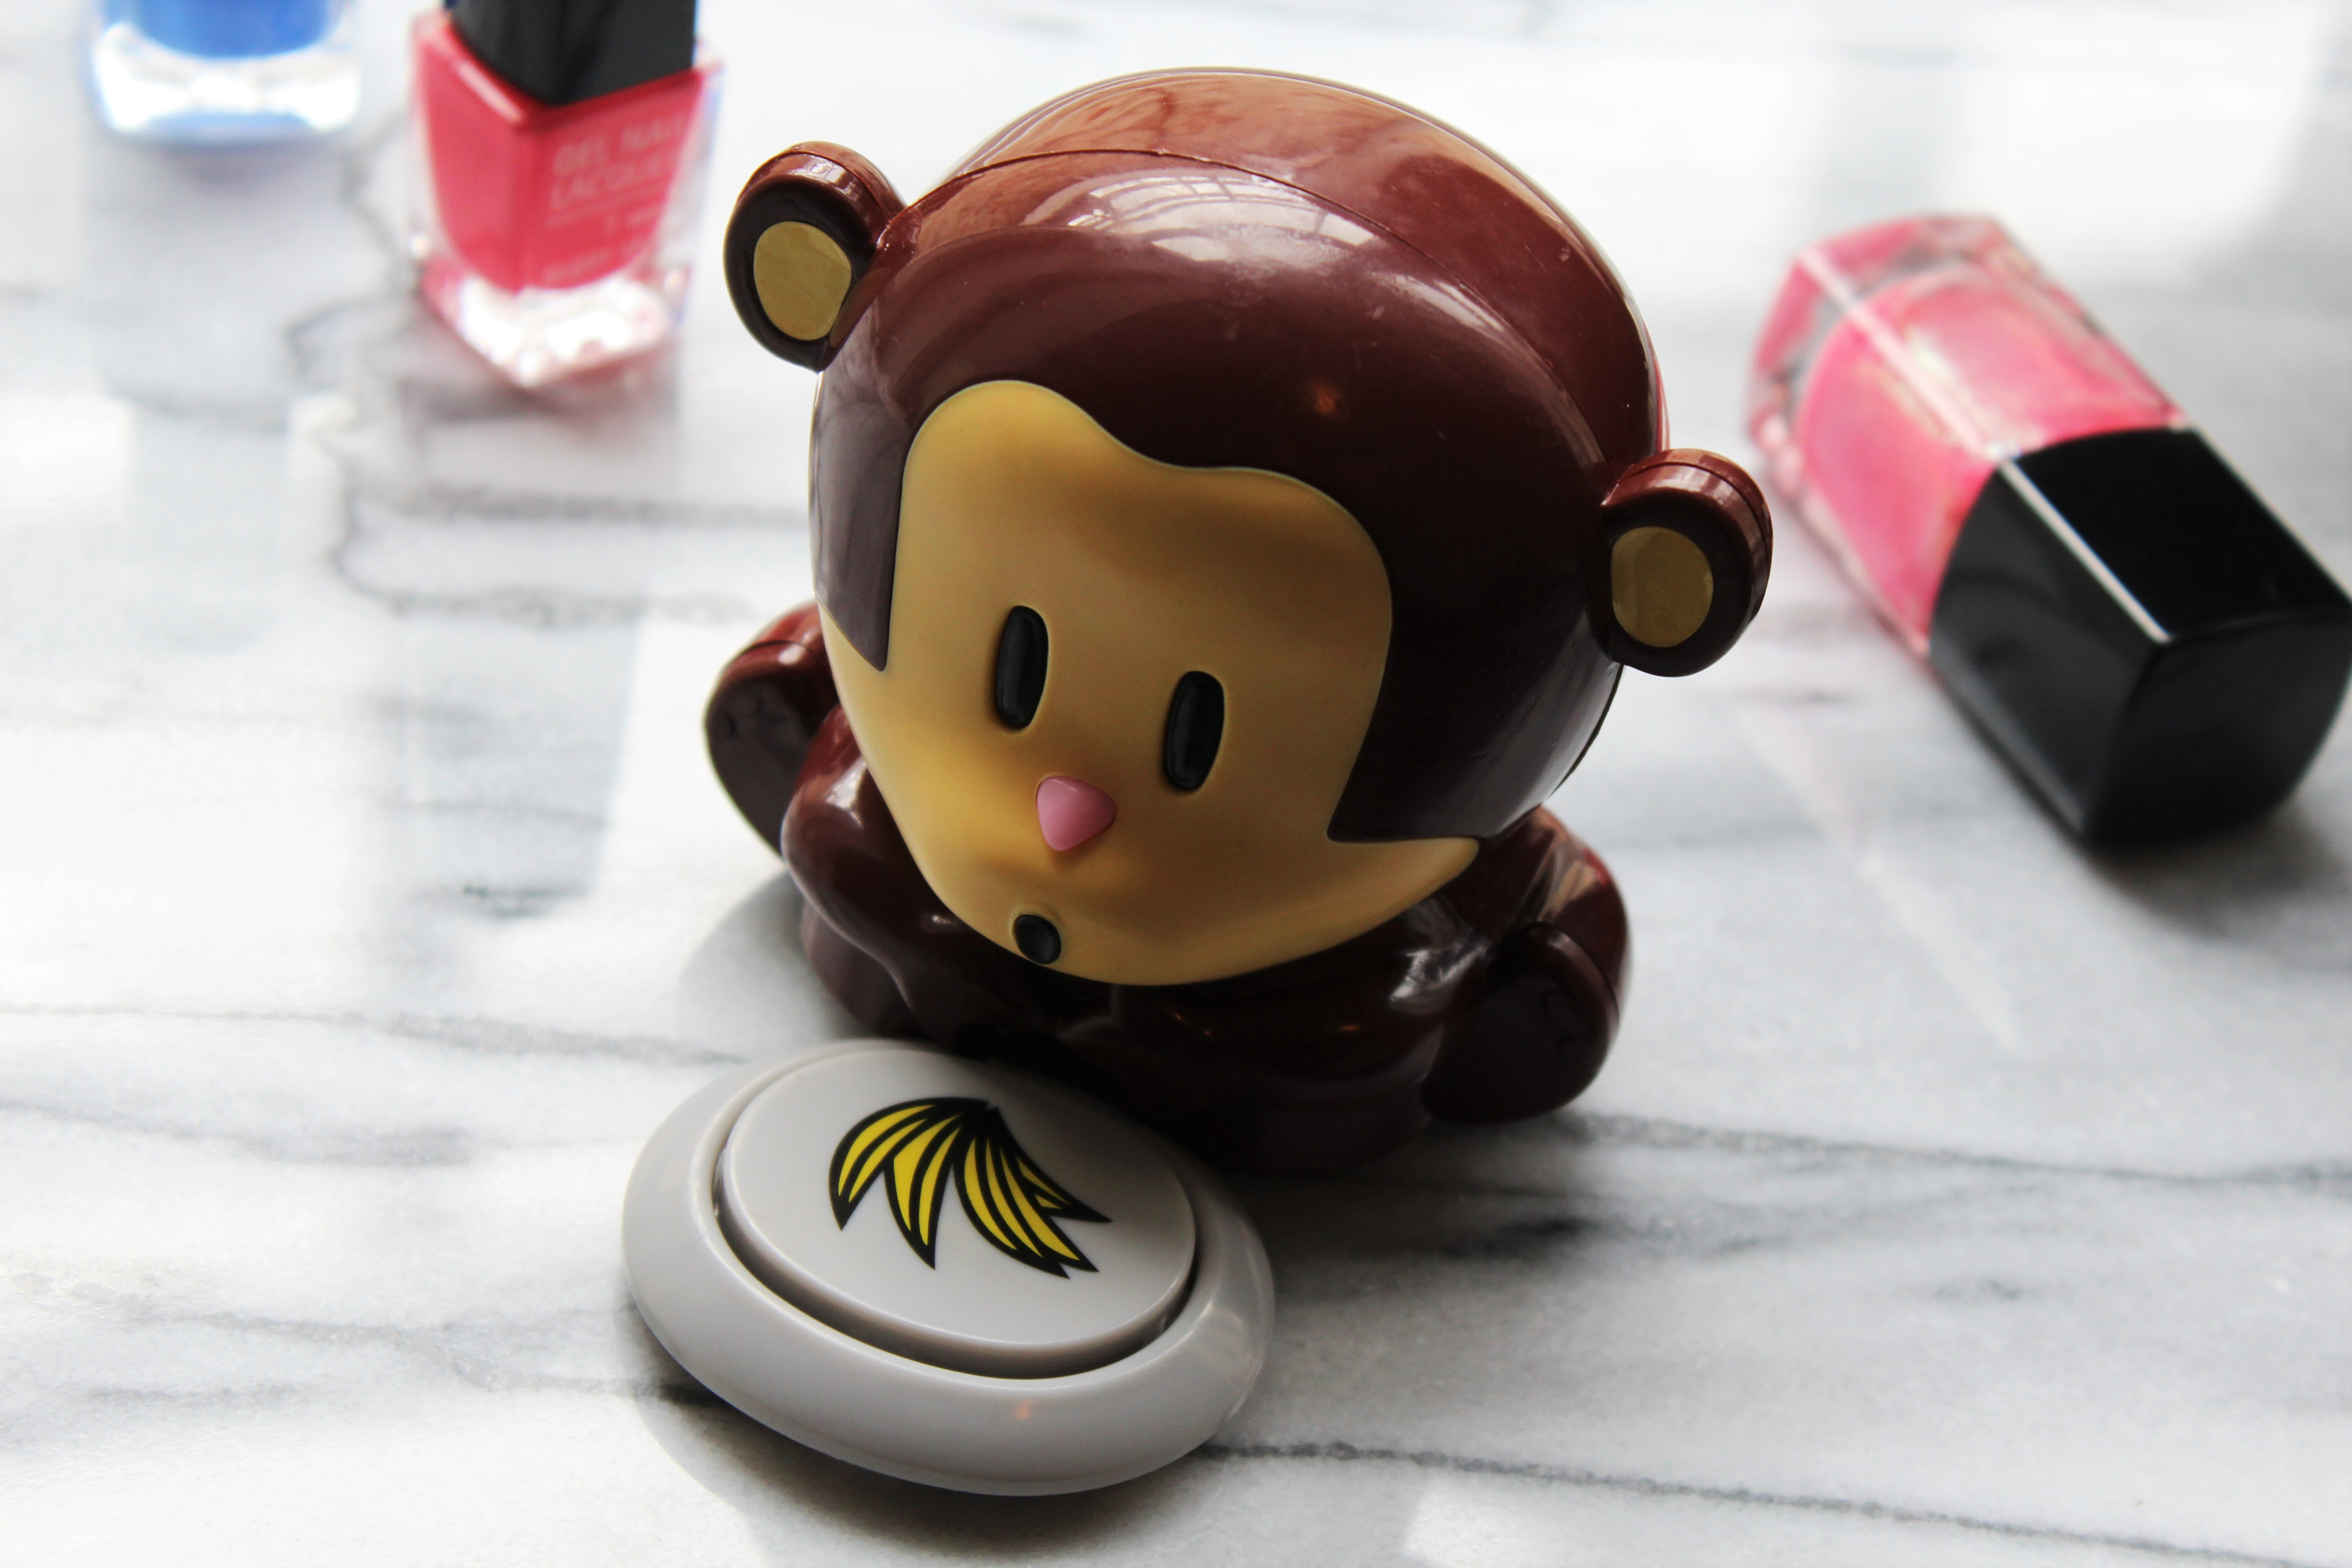 Fizz Nagellakdroger Funky Monkey | Review & winactie!